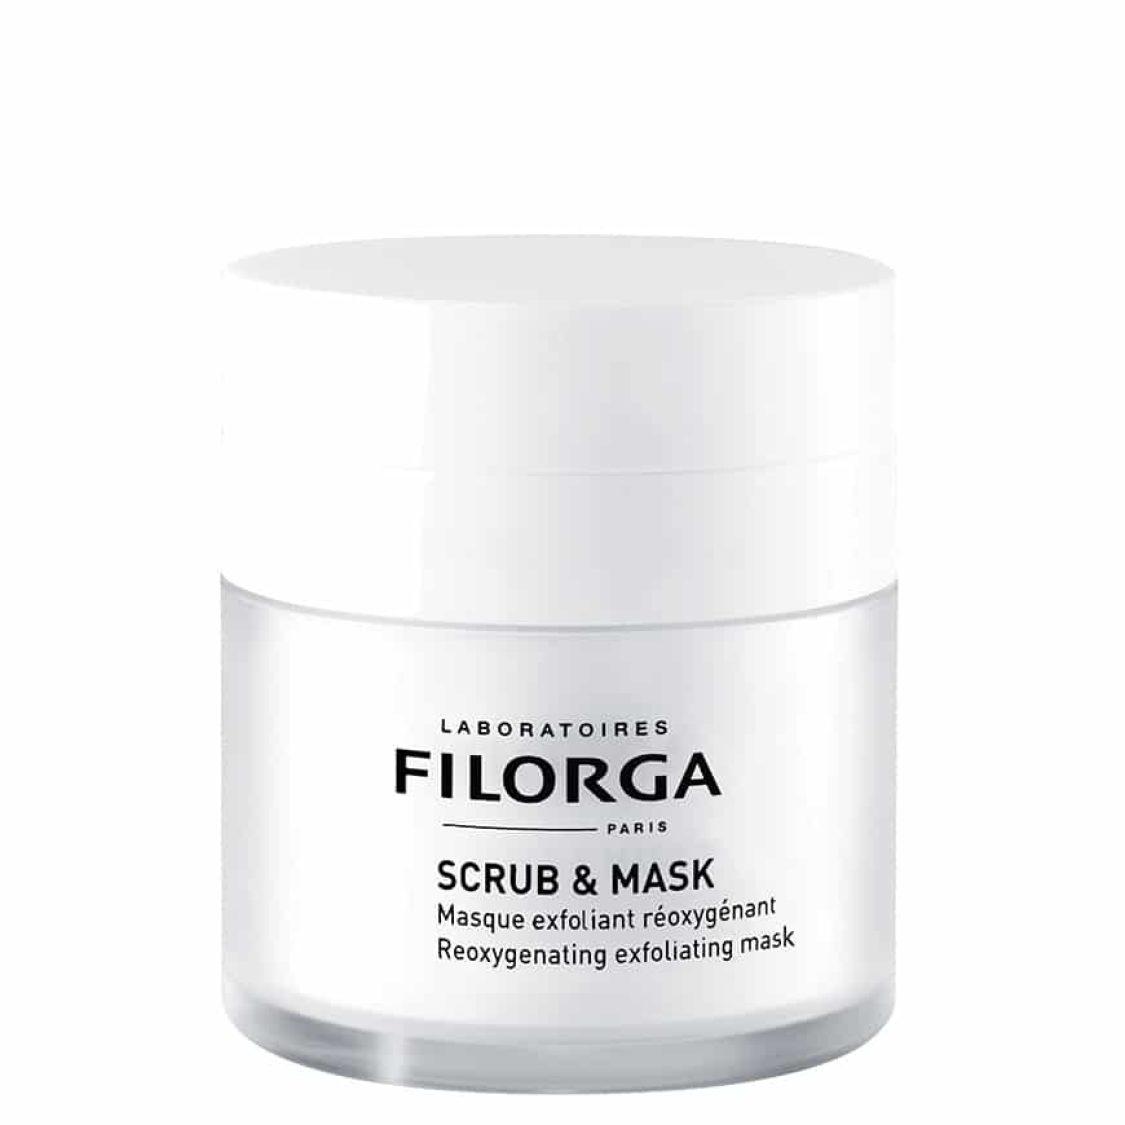 Filorga - Scrub & Mask 55ml